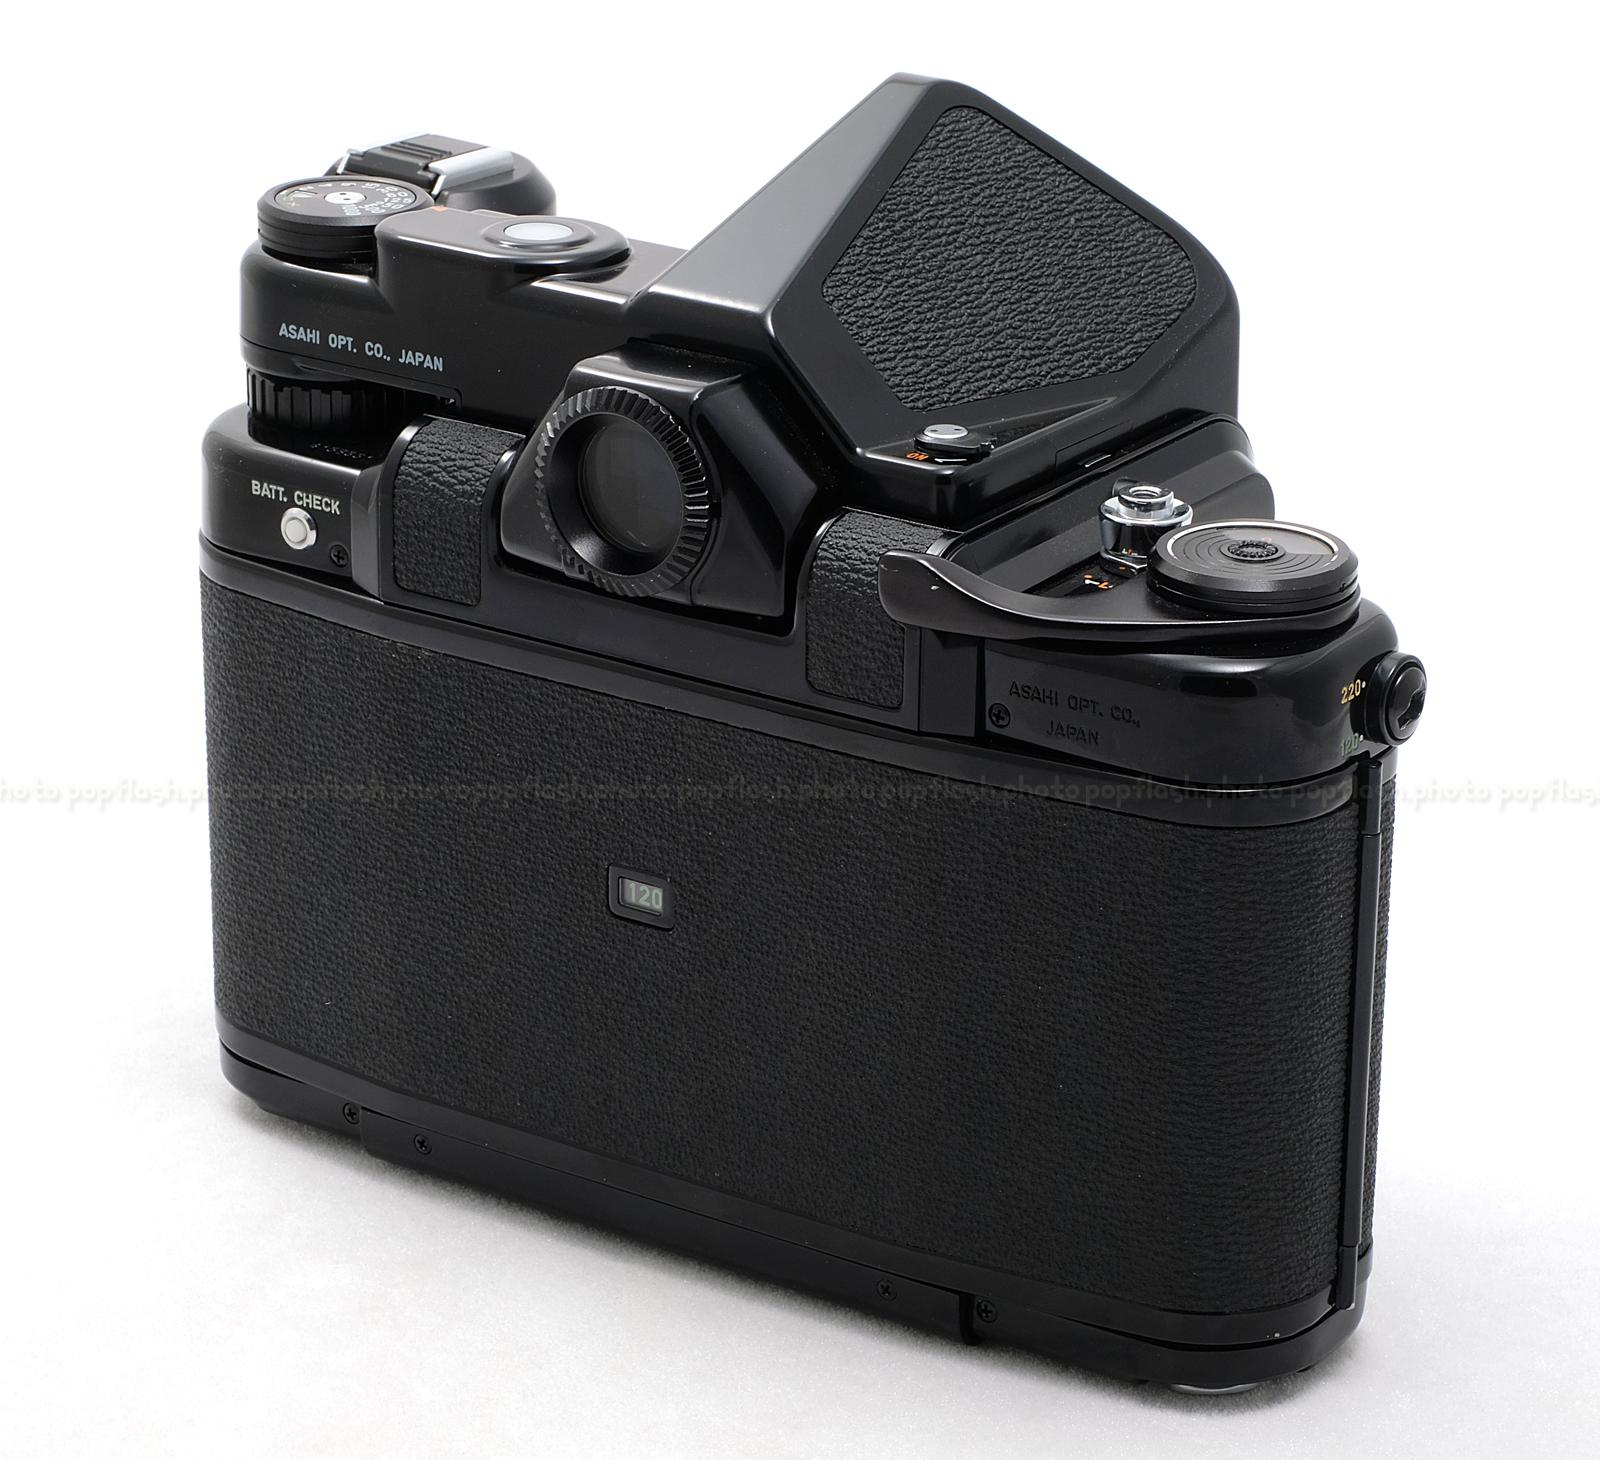 PENTAX ASAHI 6x7 TTL FILM CAMERA USED (MLU VERSION) with 135MM  MACRO-TAKUMAR & WOOD HAND GRIP